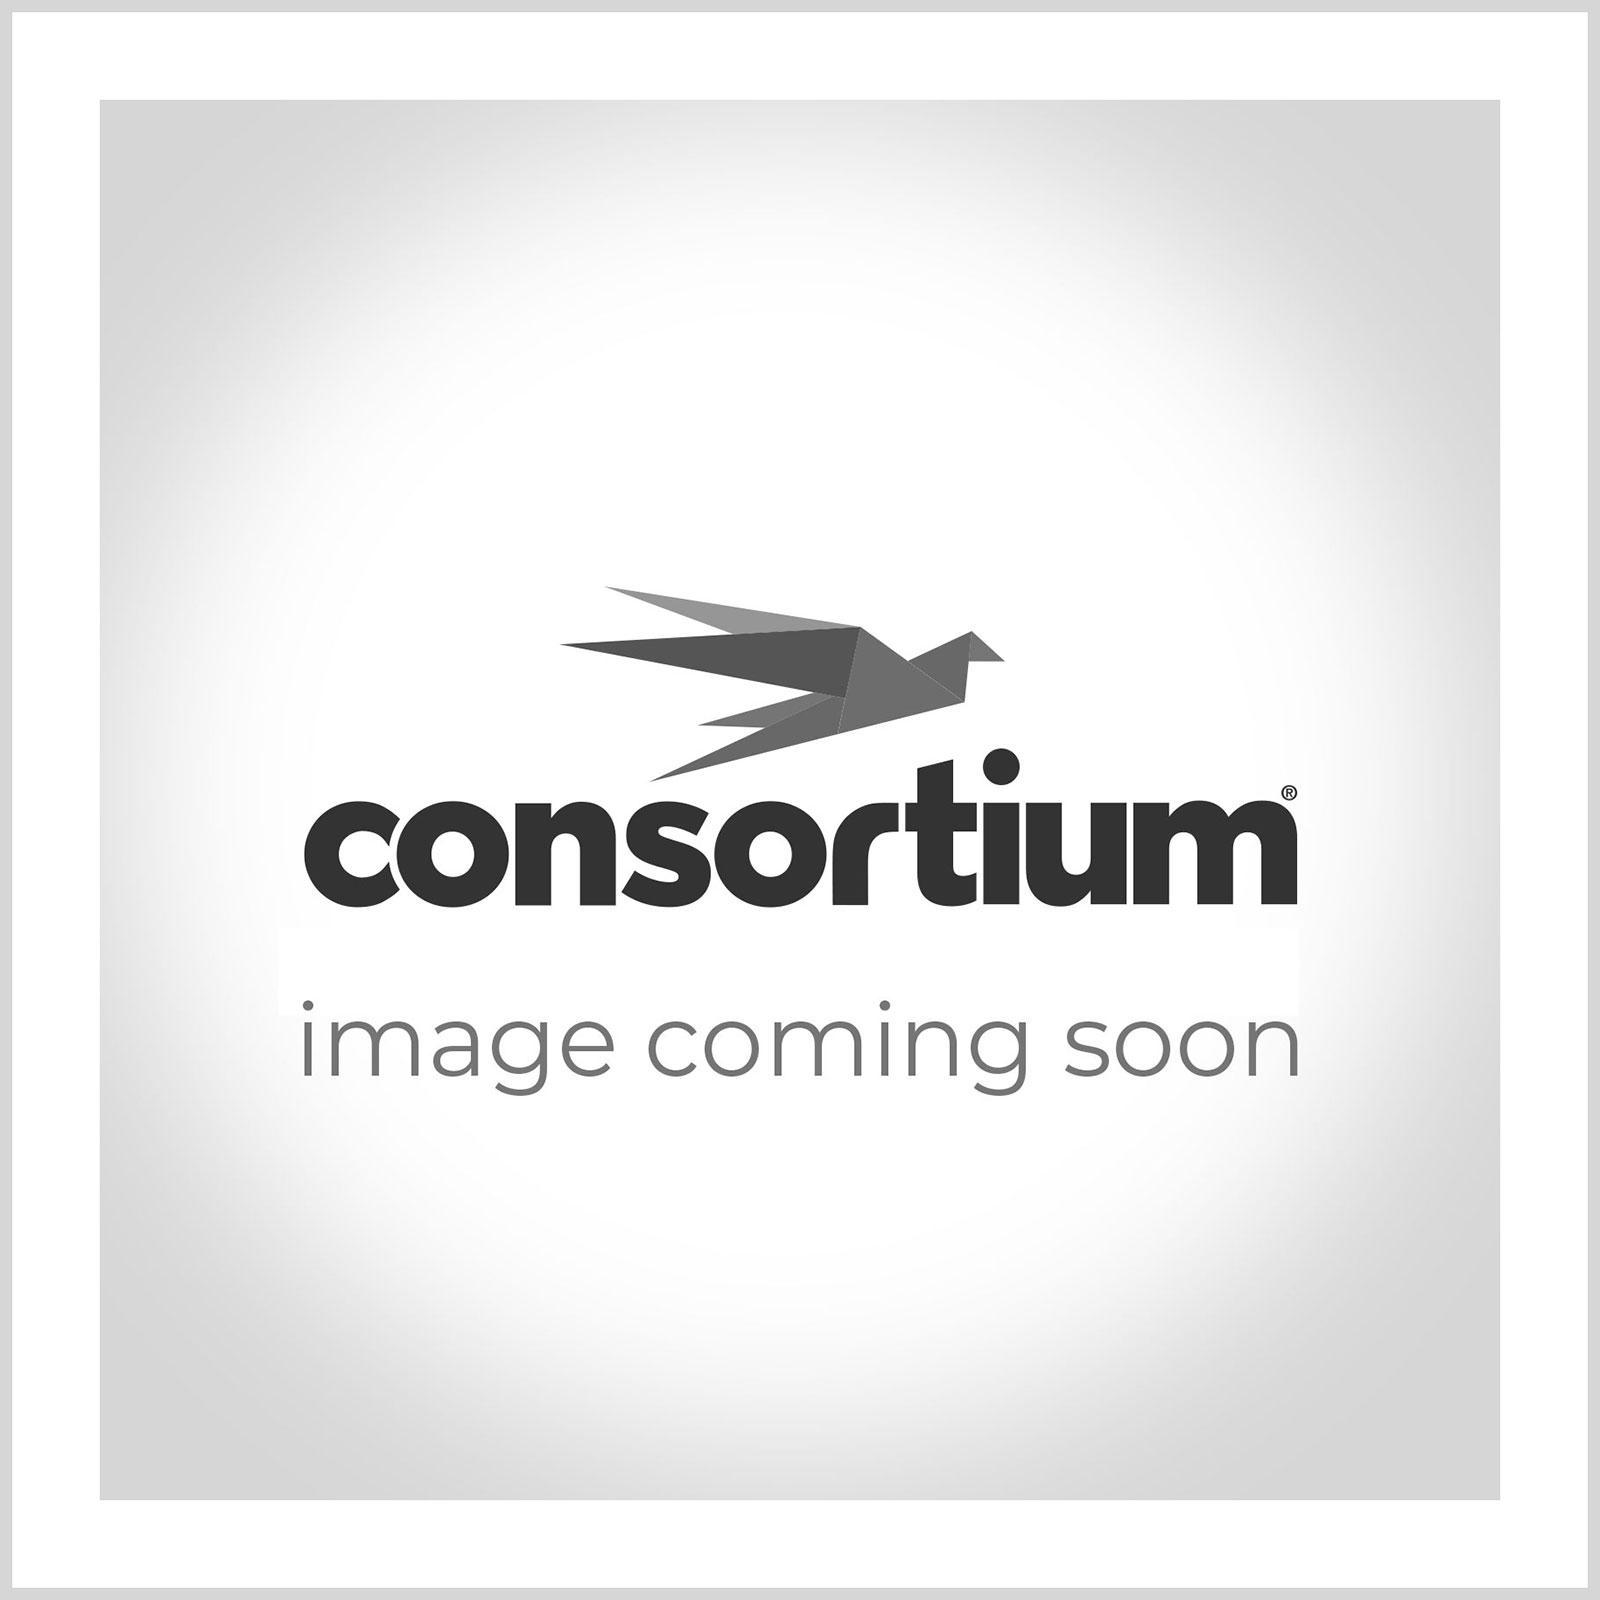 3M Spray Mount Adhesive